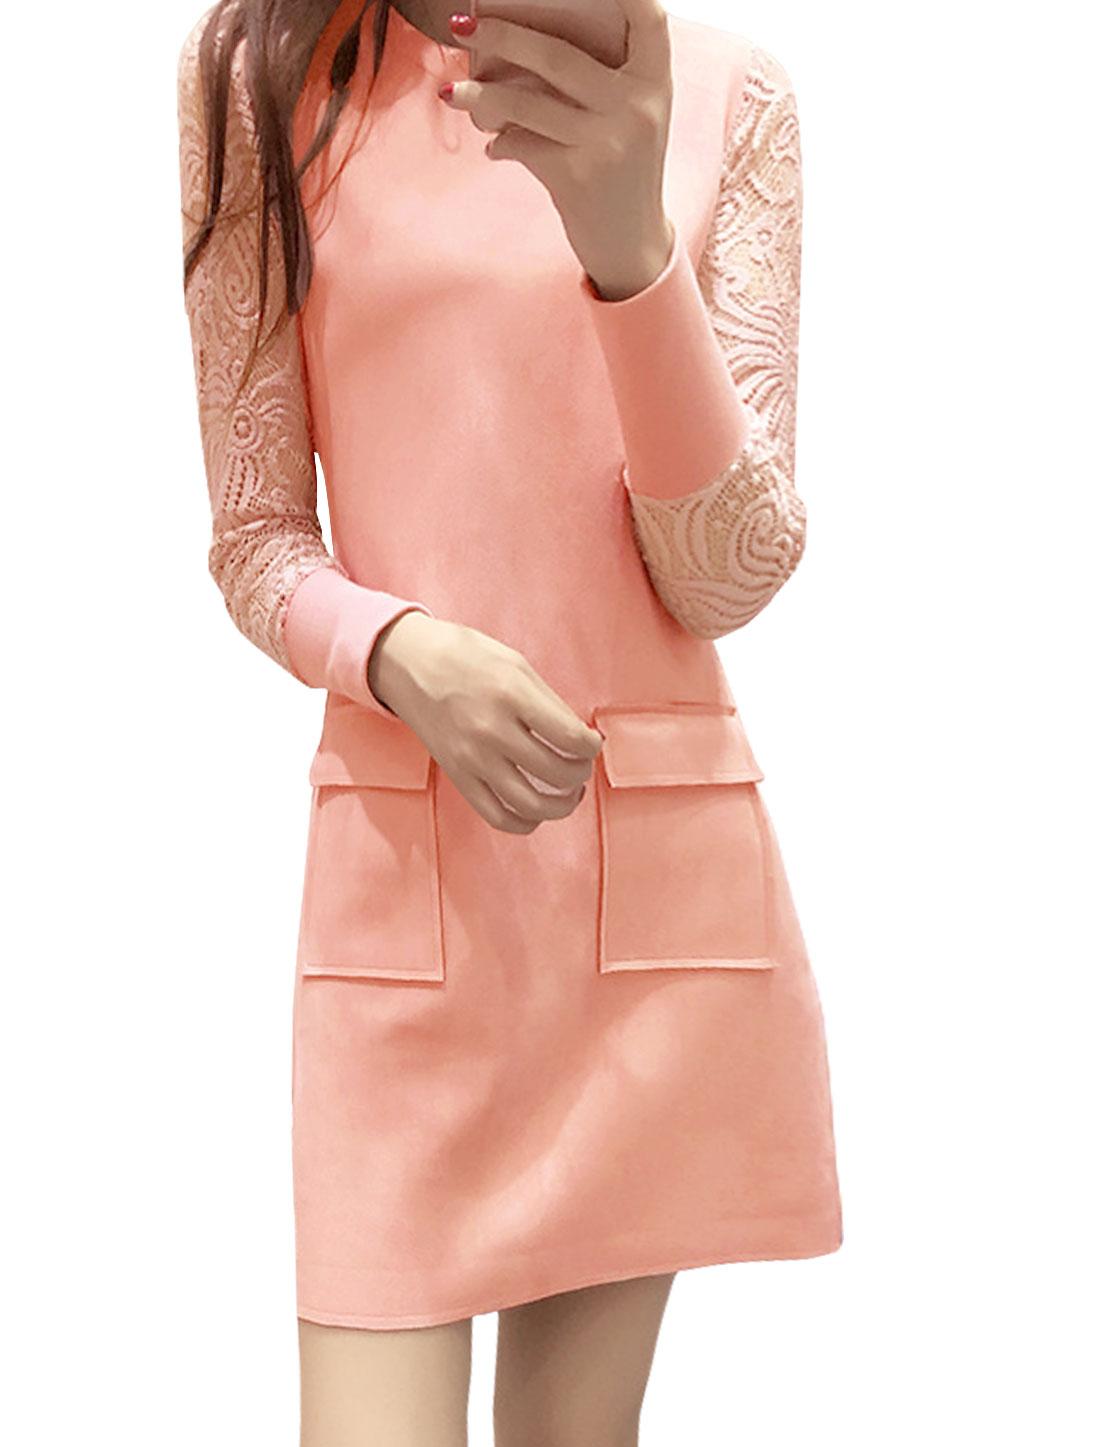 Lady Crew Neck Semi Sheer Sleeves Lace Panel Tunic Dress Pink M